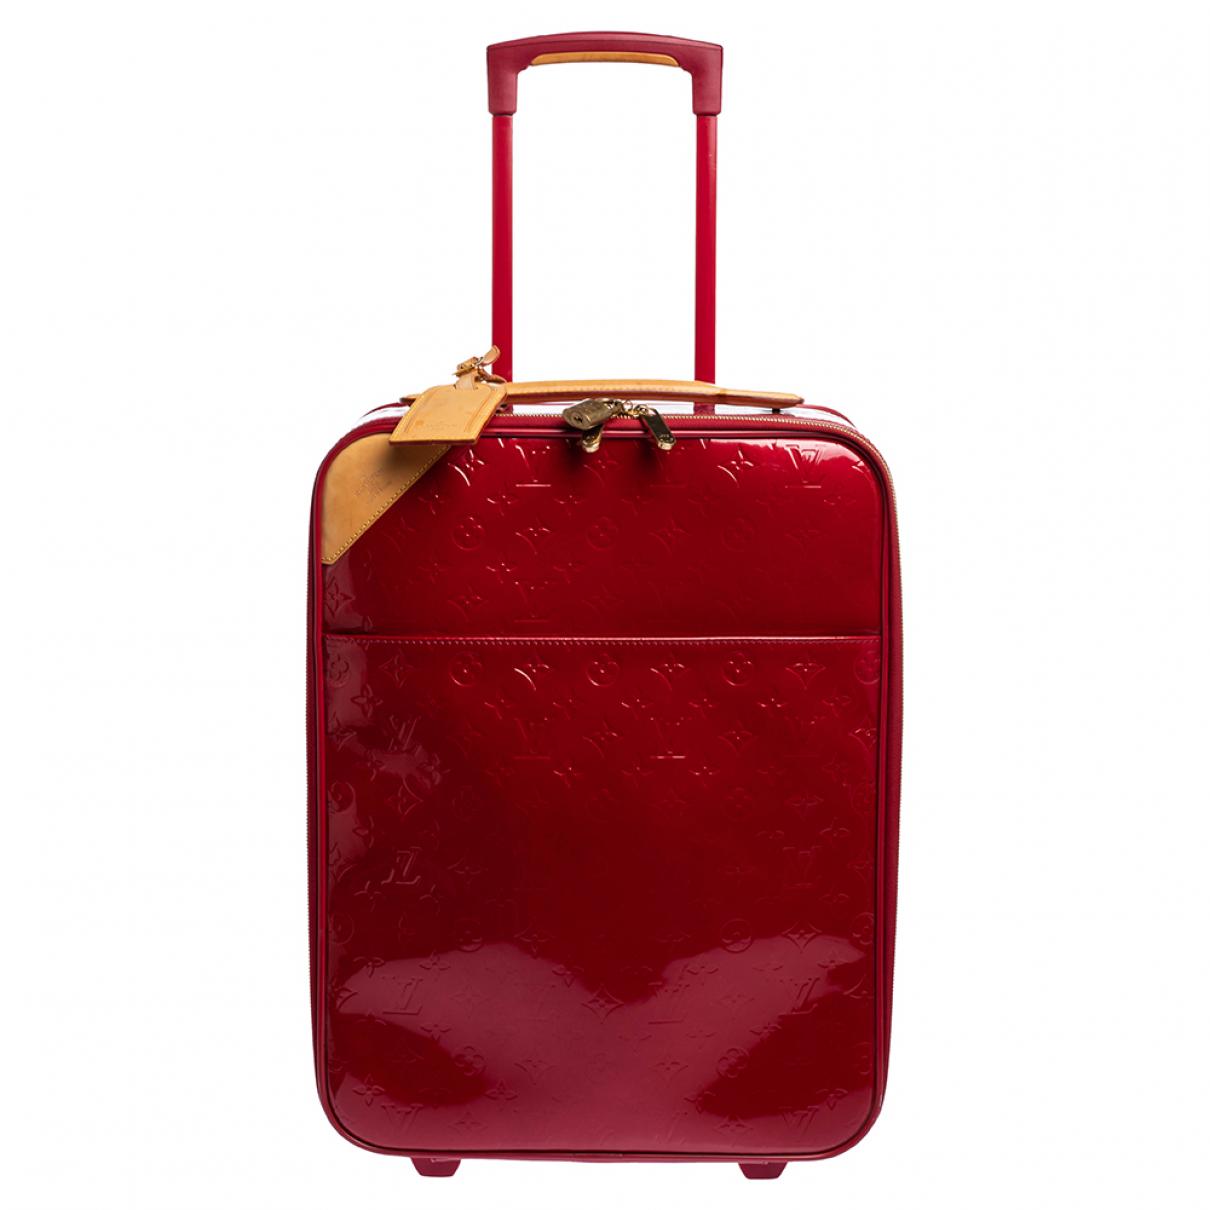 Bolso de viaje Pegase de Charol Louis Vuitton